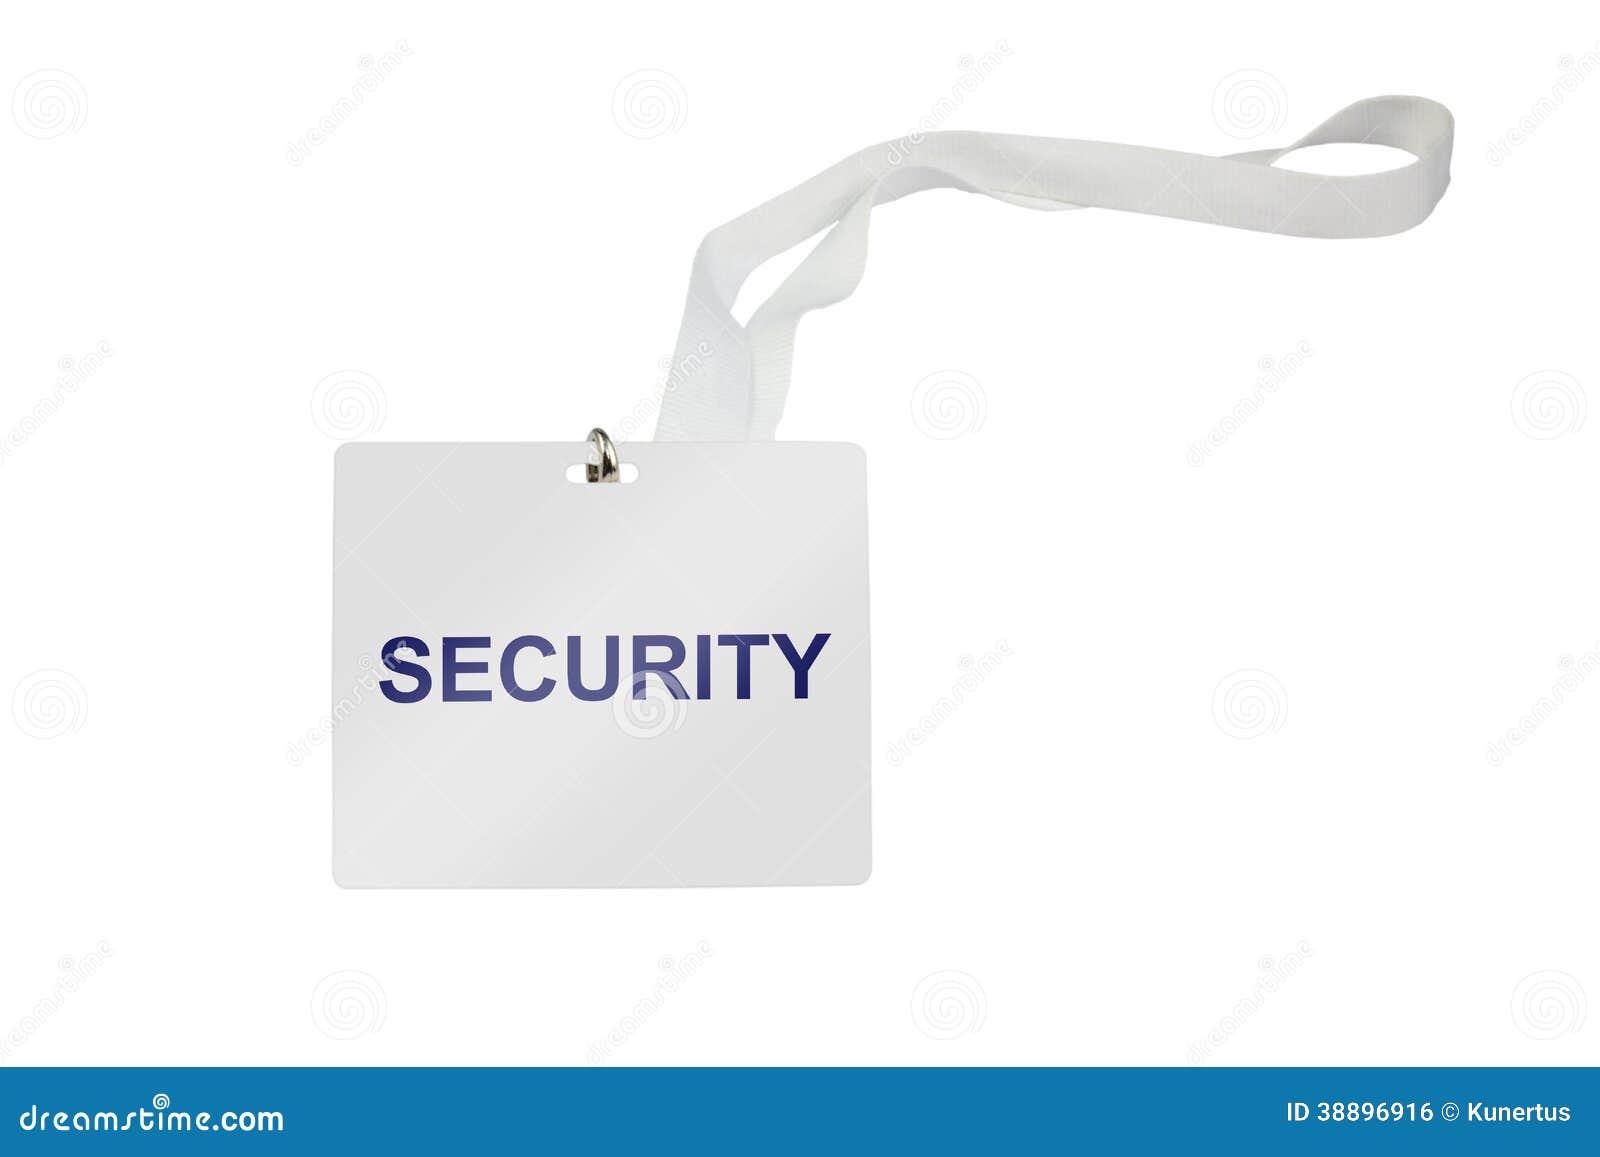 security pass template - Isken kaptanband co